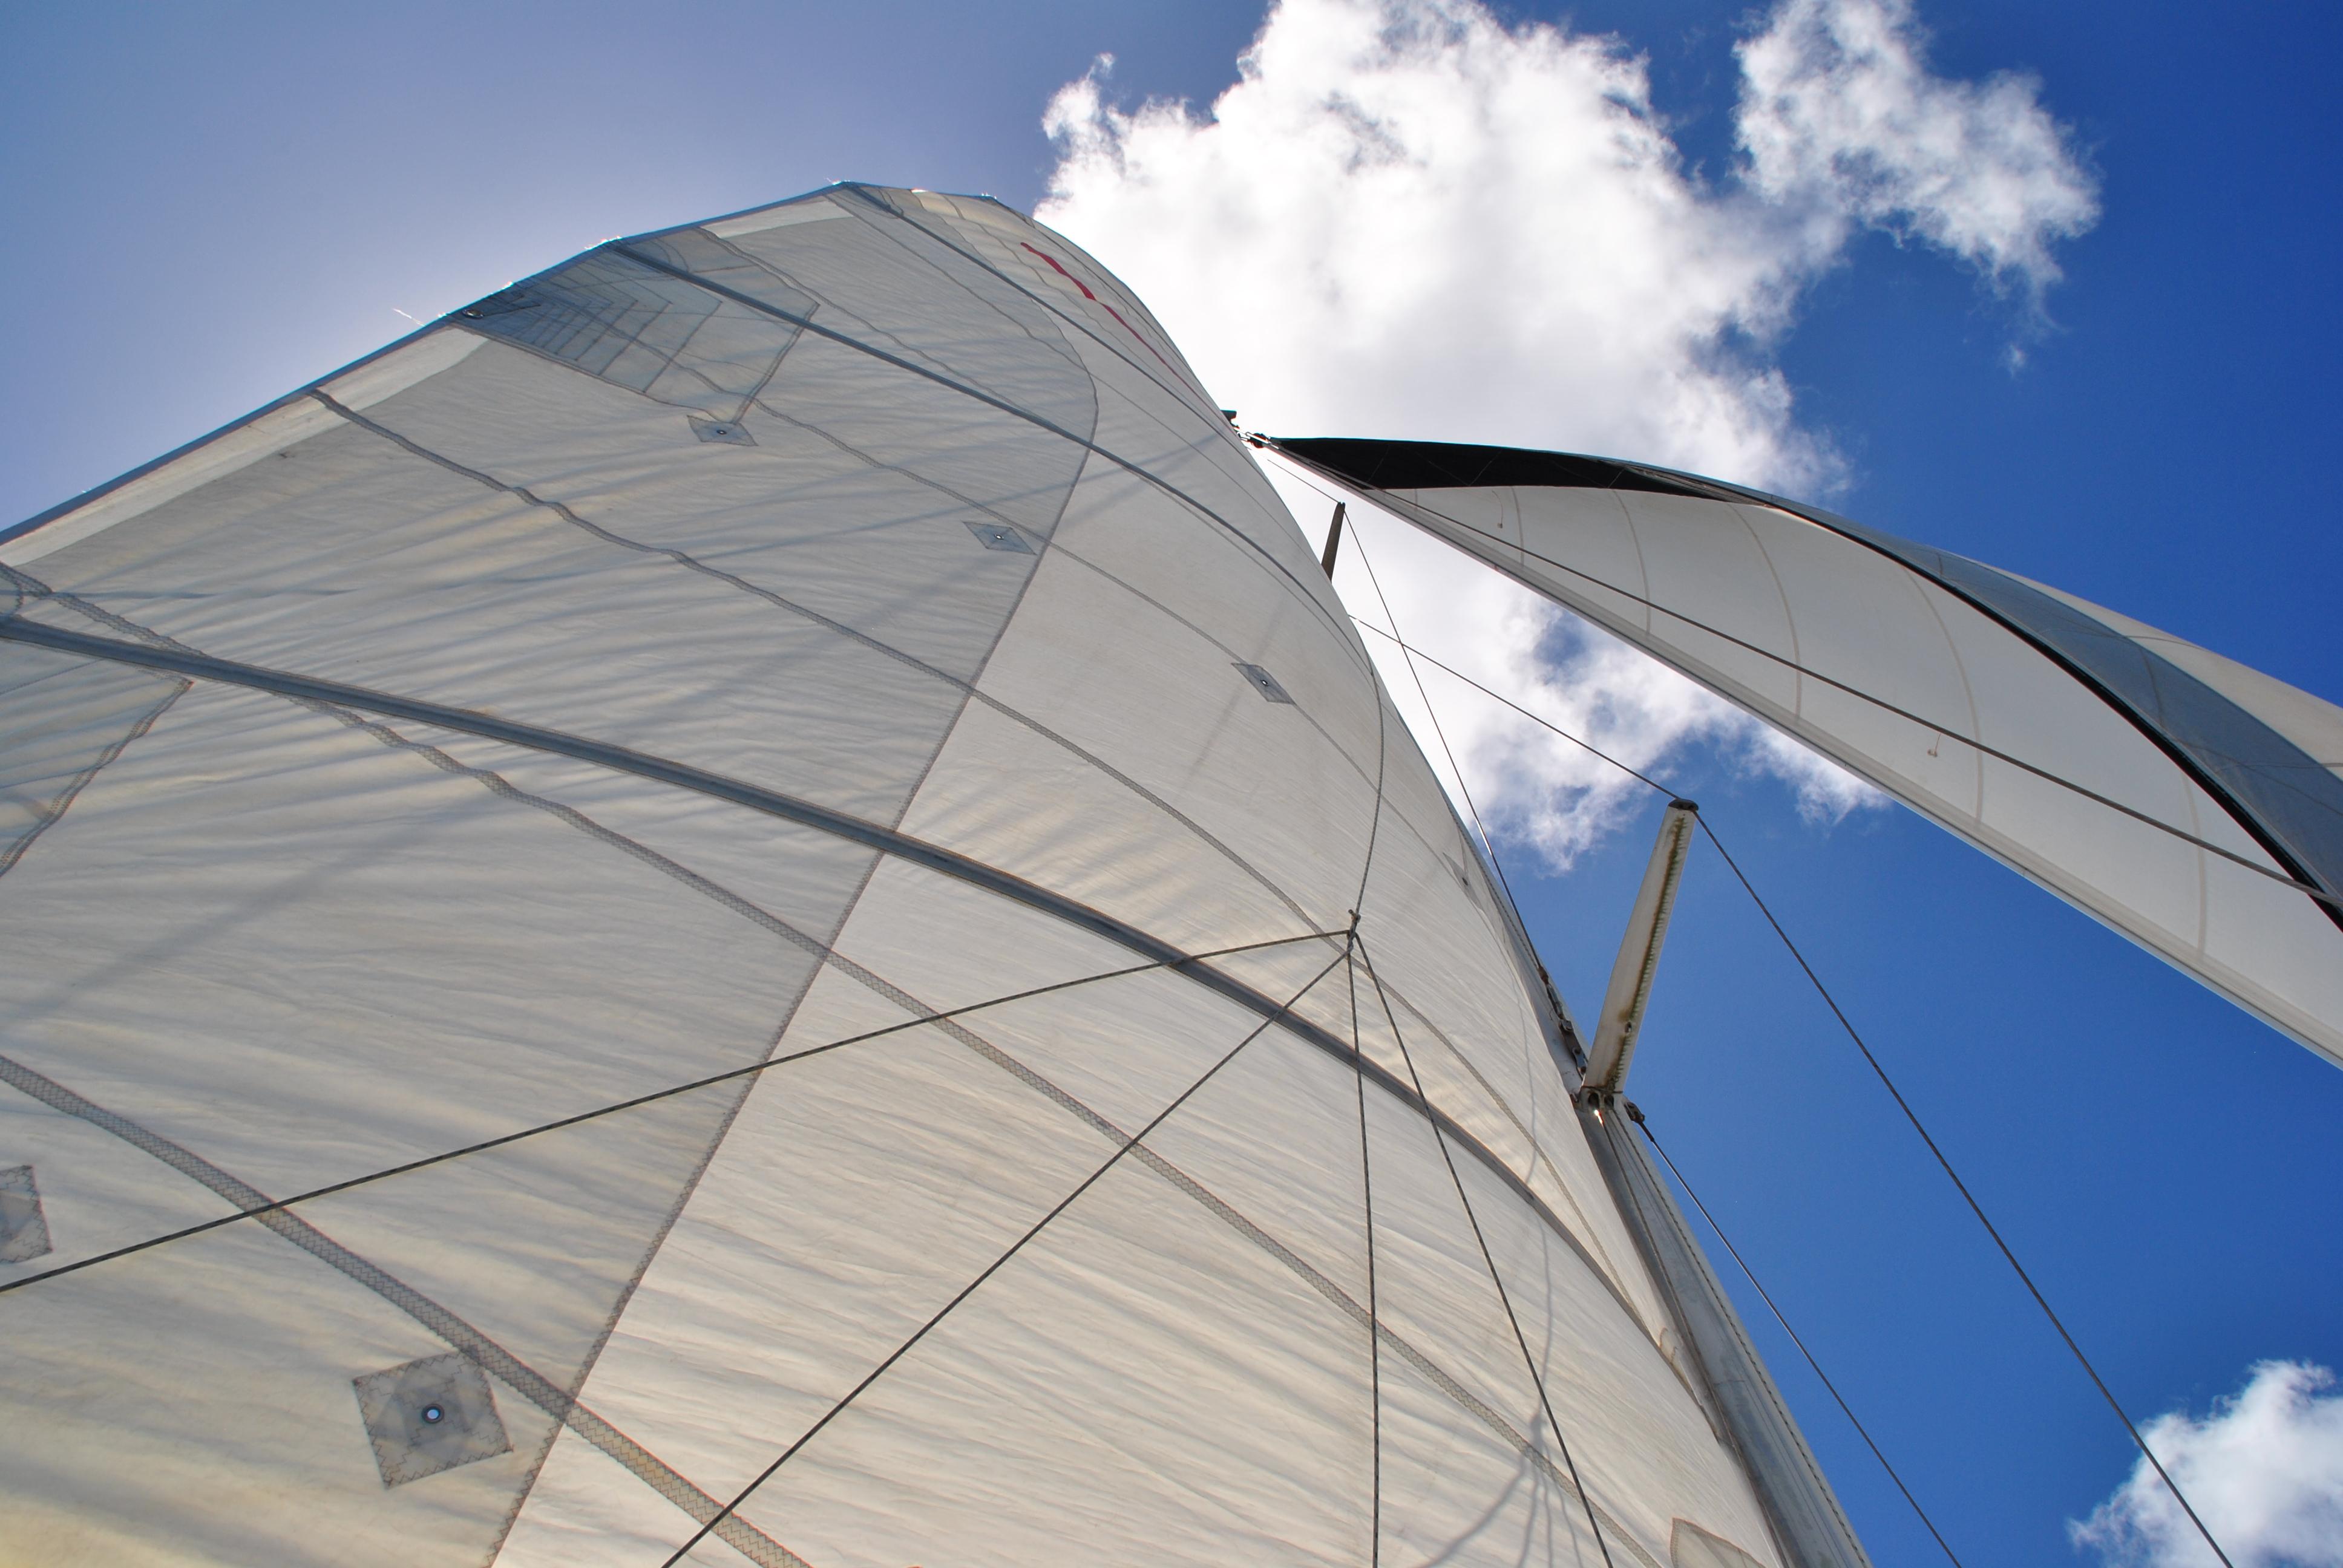 We Provide A Complete Solent Sail Laundry Service